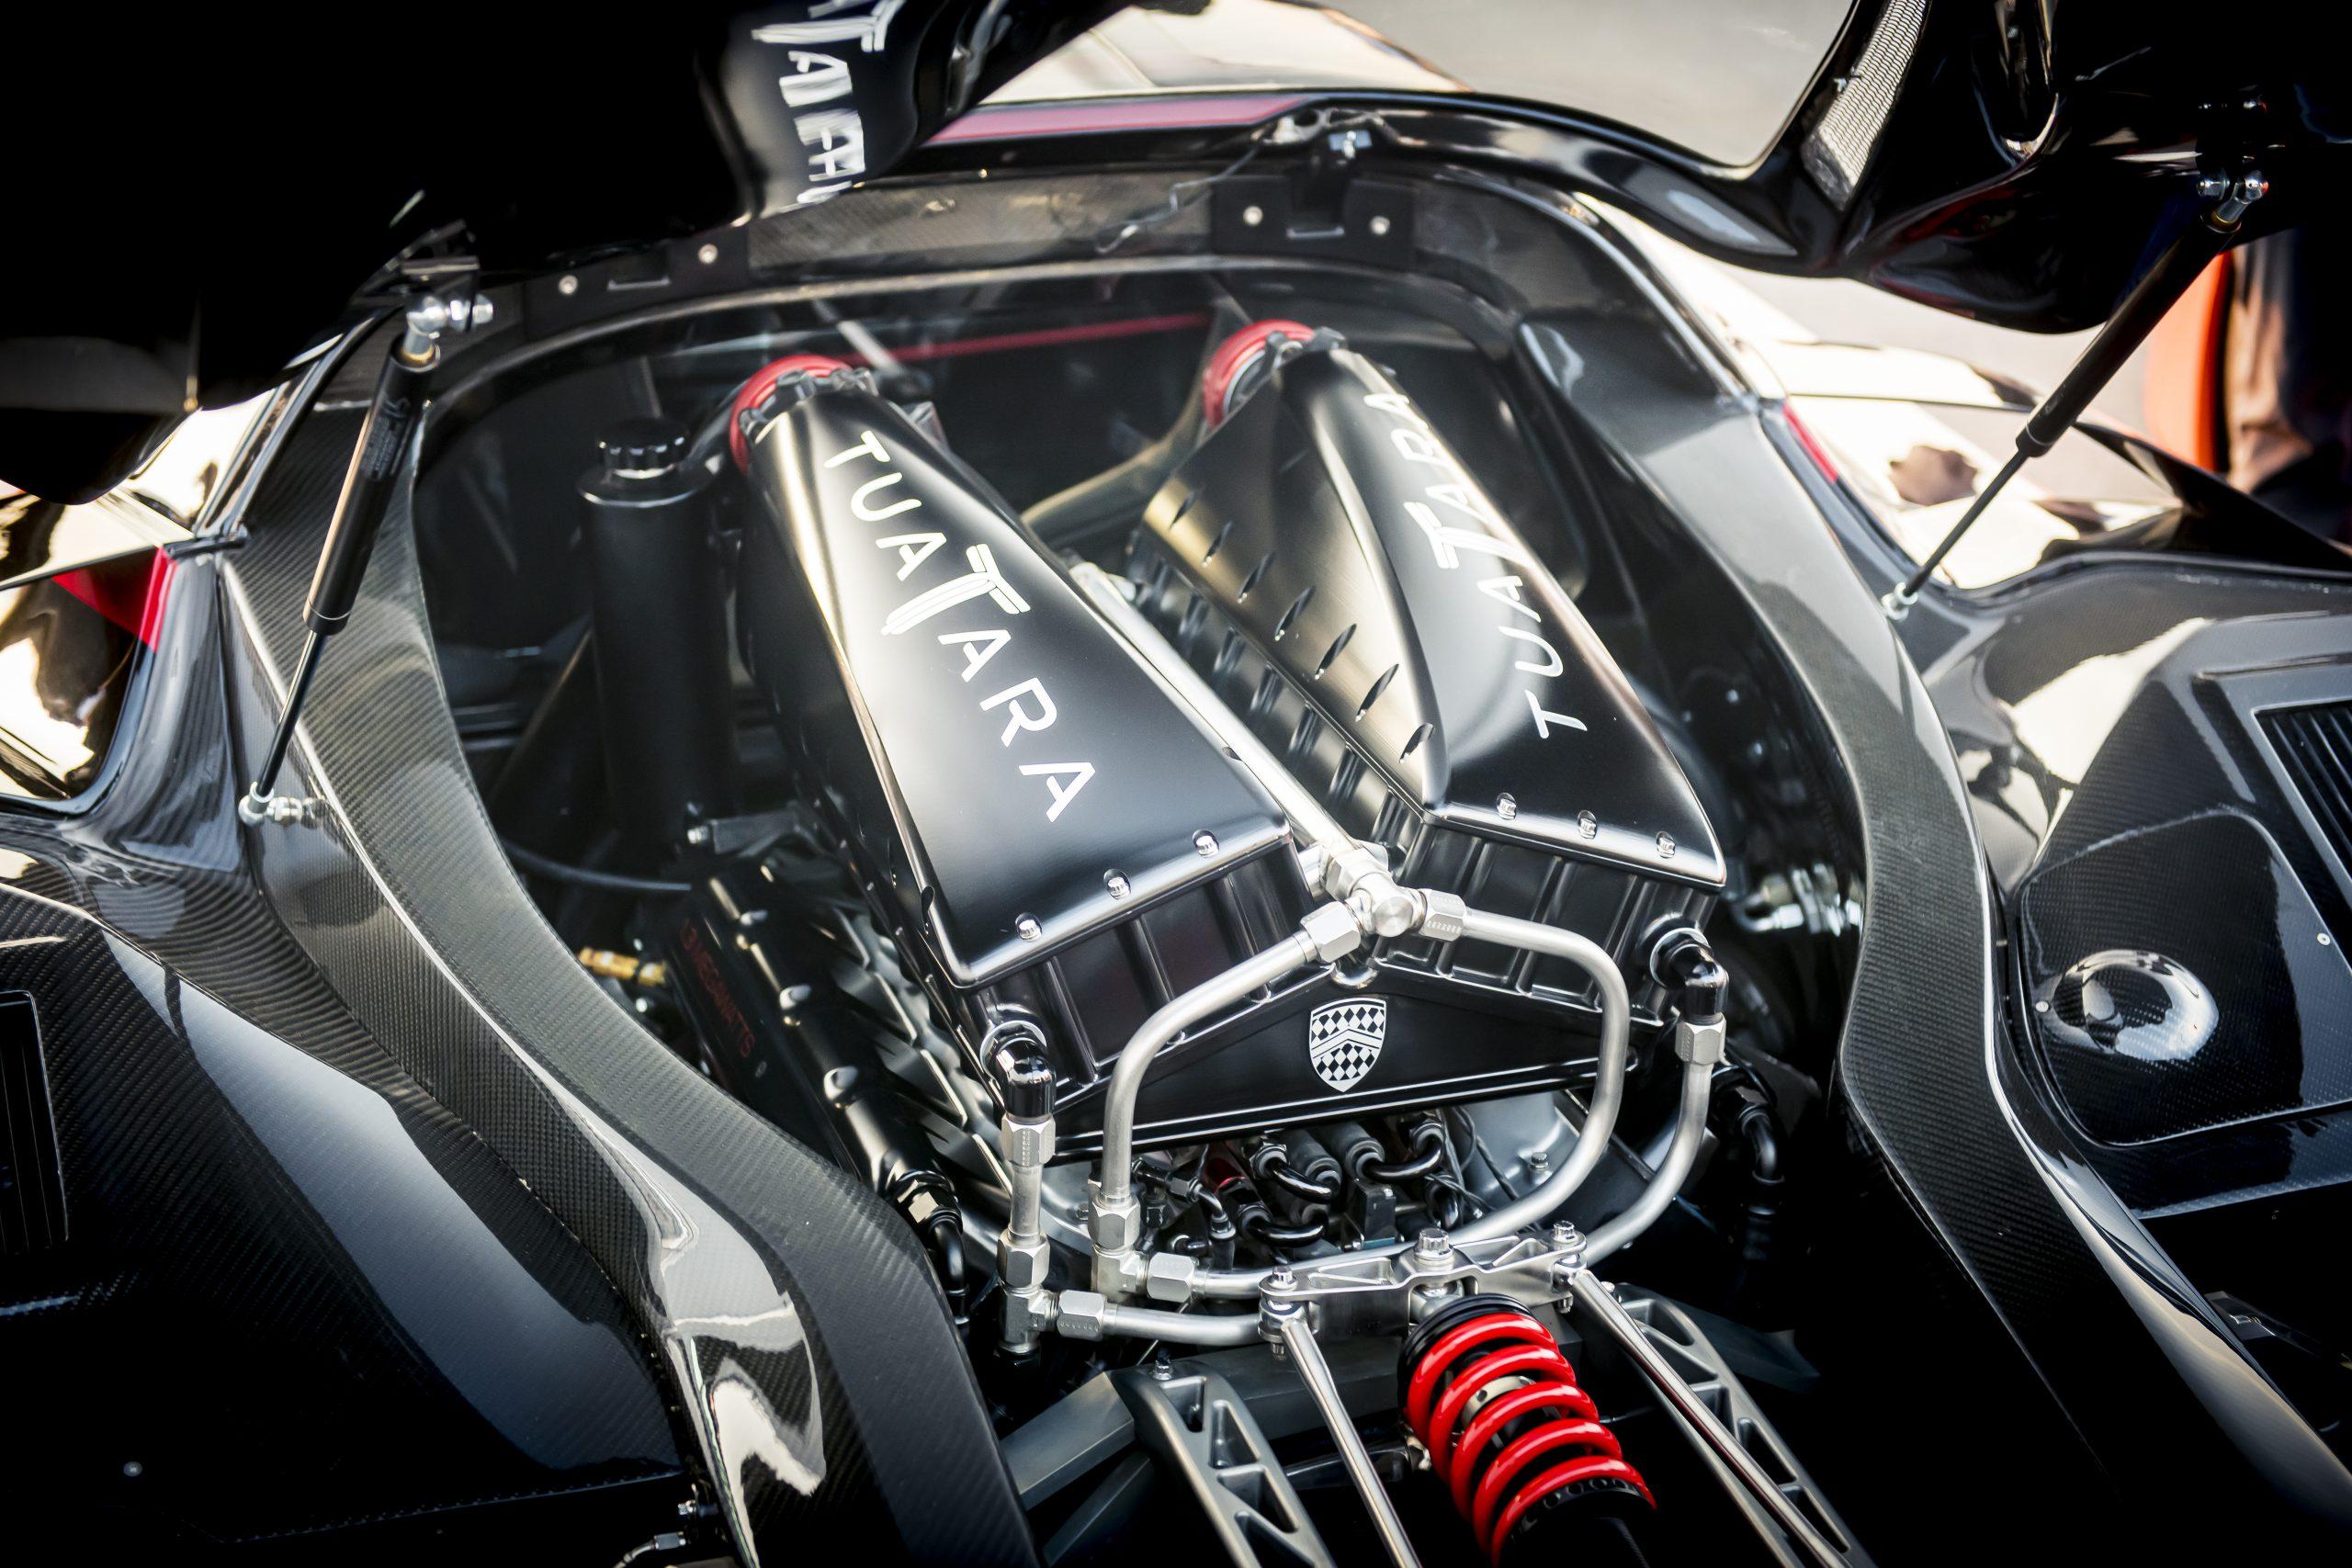 SSC Tuatara Production Car Speed Record engine